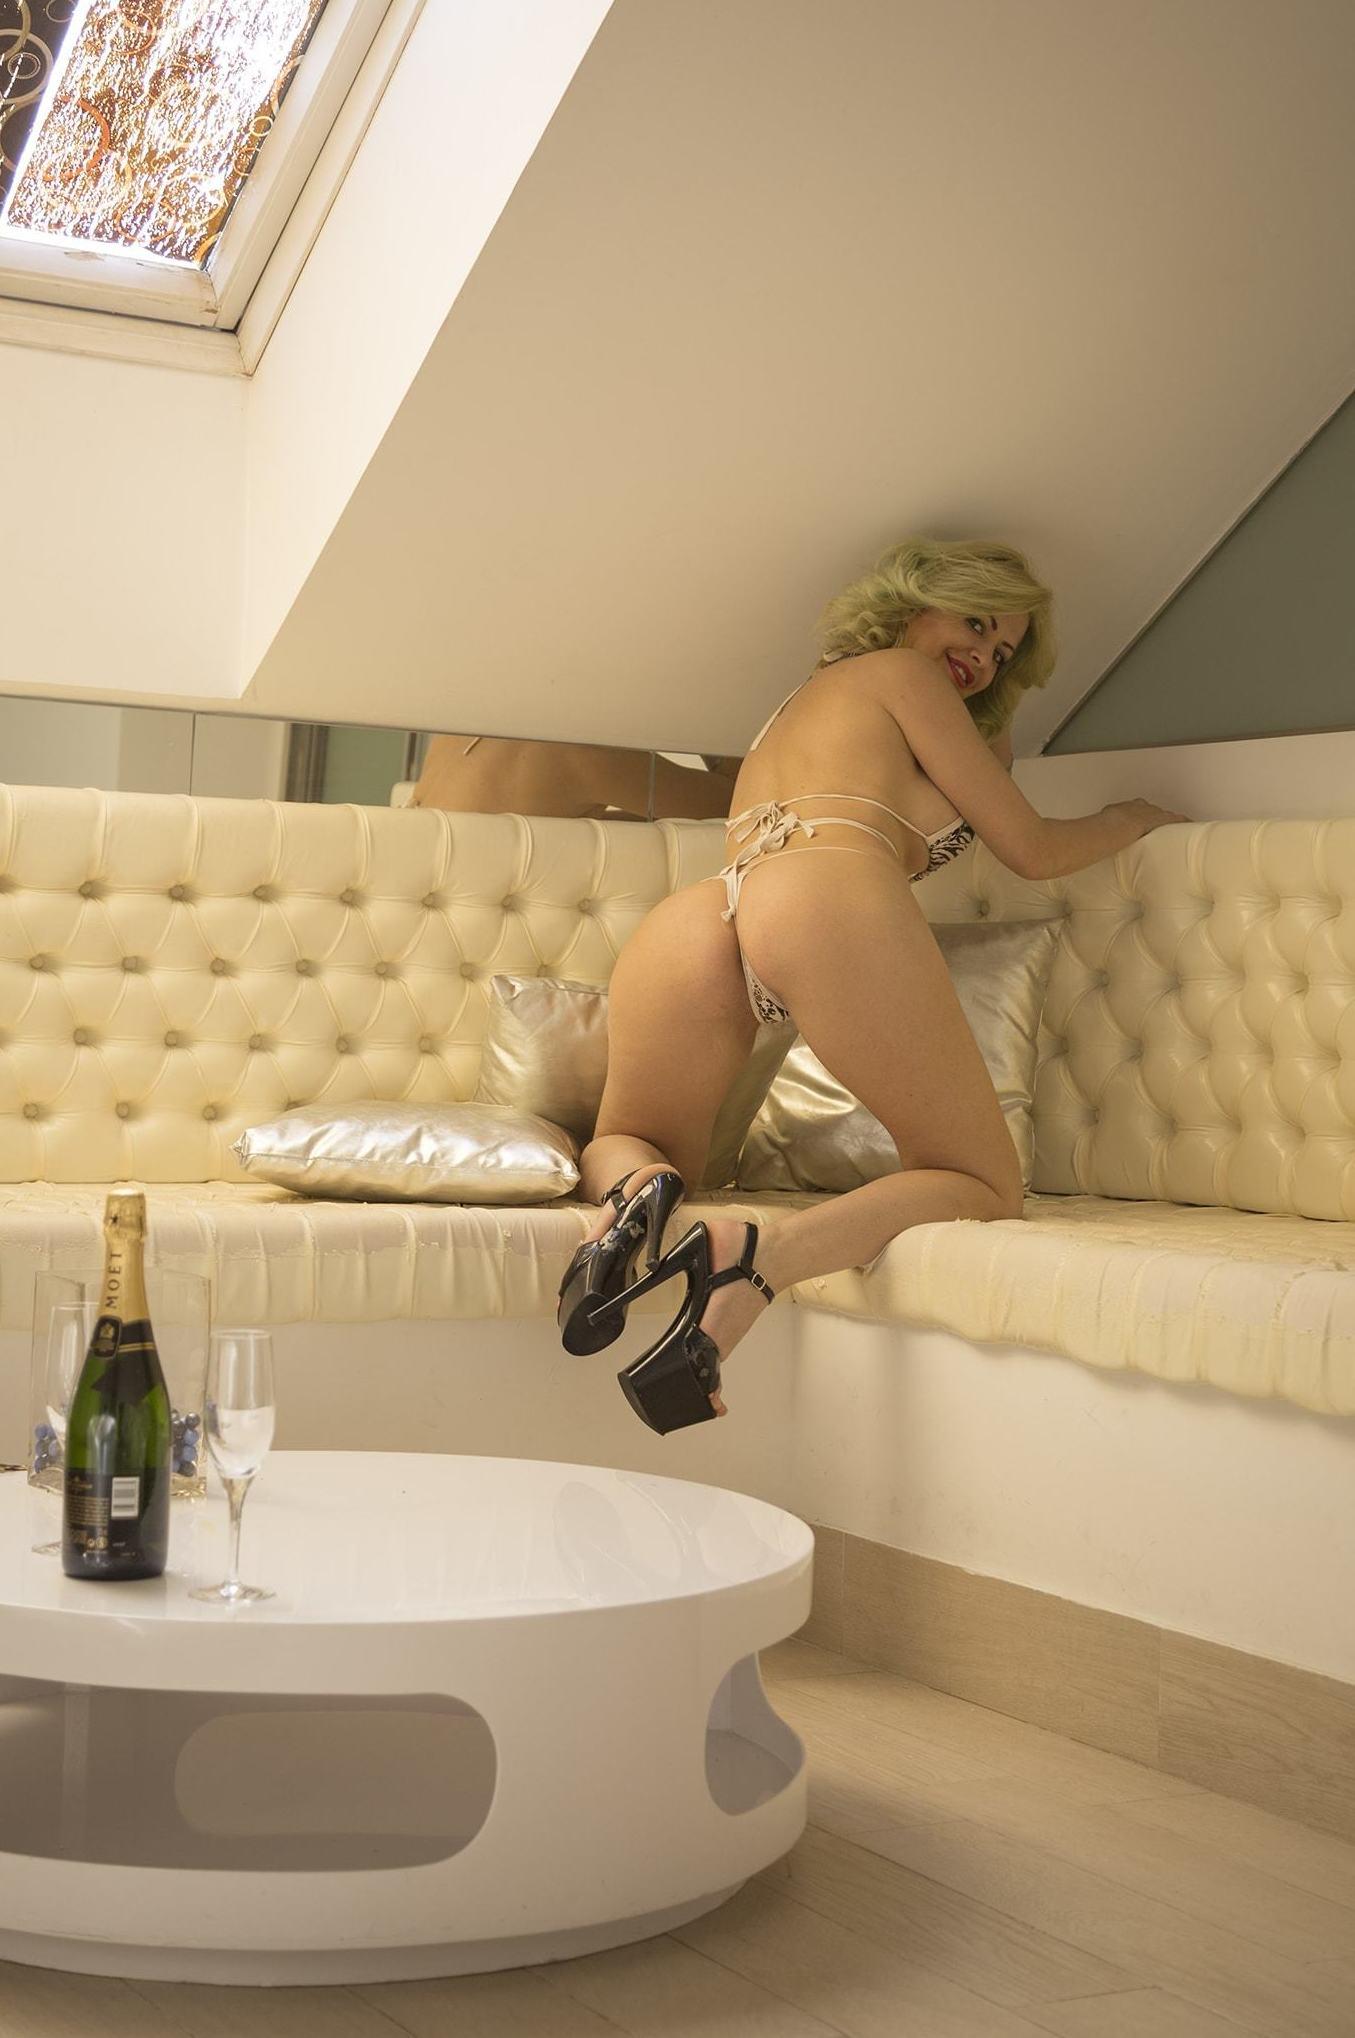 Foto 5 de Clubs nocturnos en  | Latin Lover